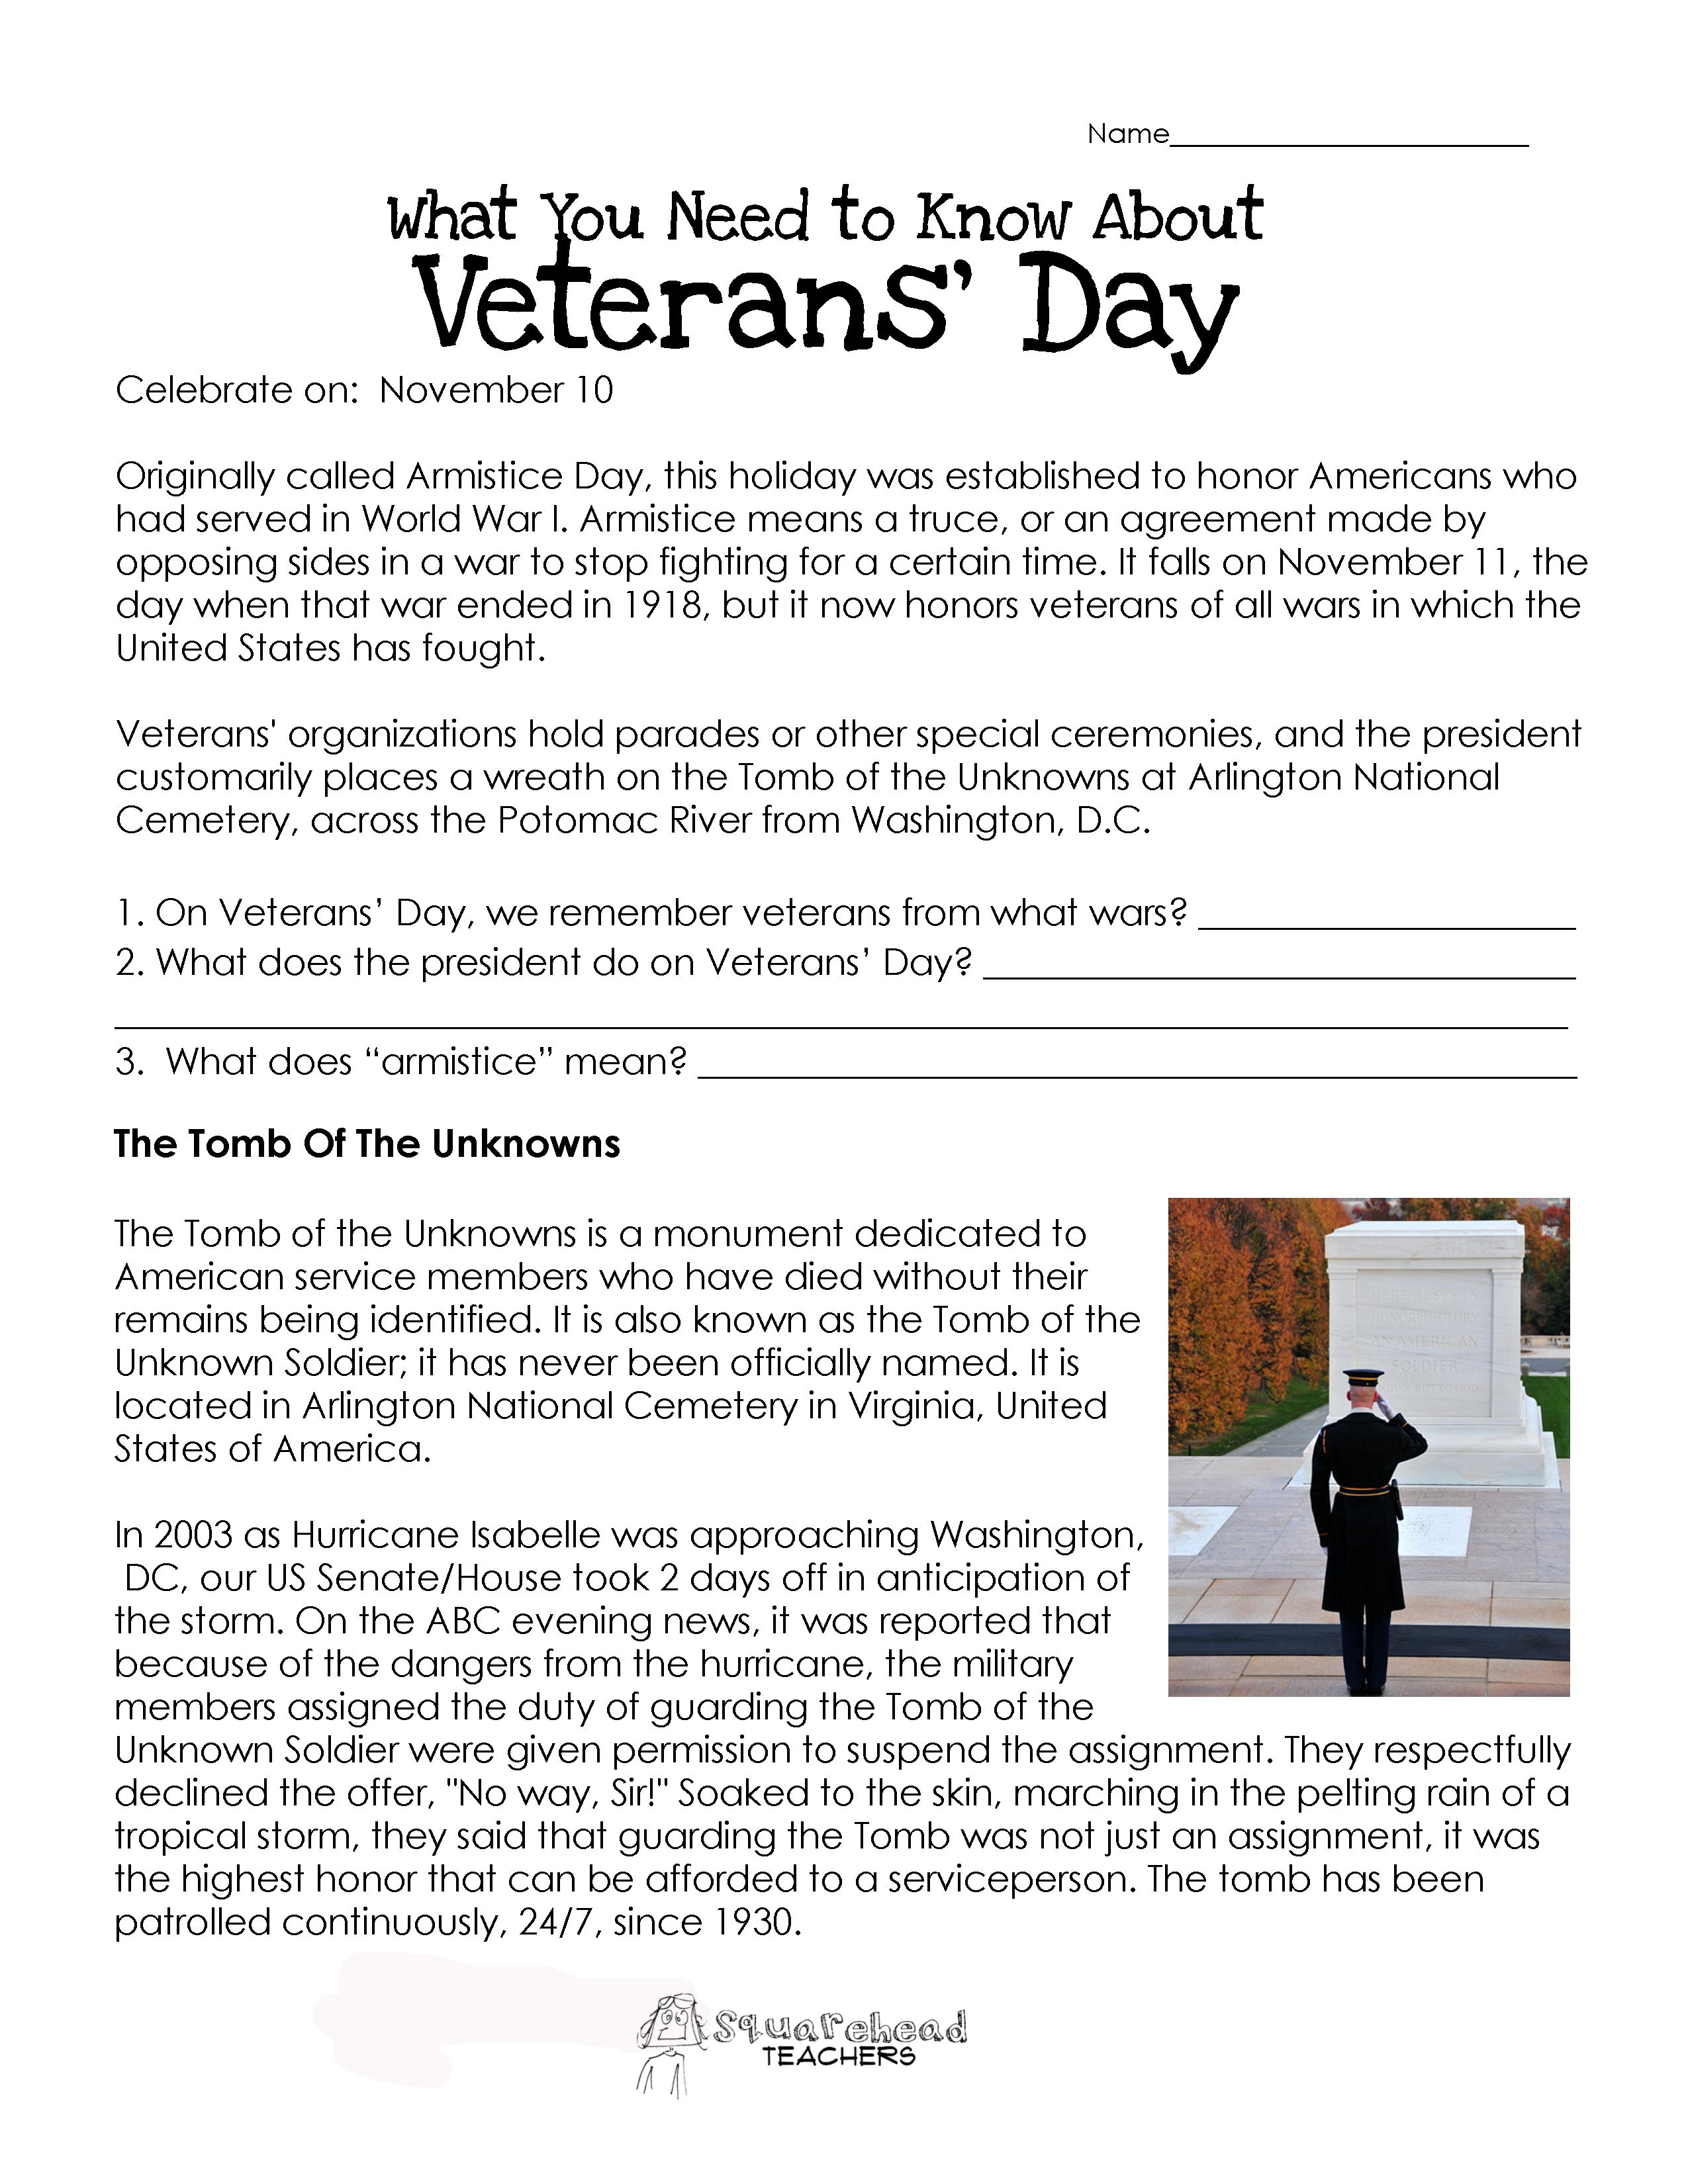 veterans day worksheets Veterans Day Worksheet – Veterans Day Worksheets Free